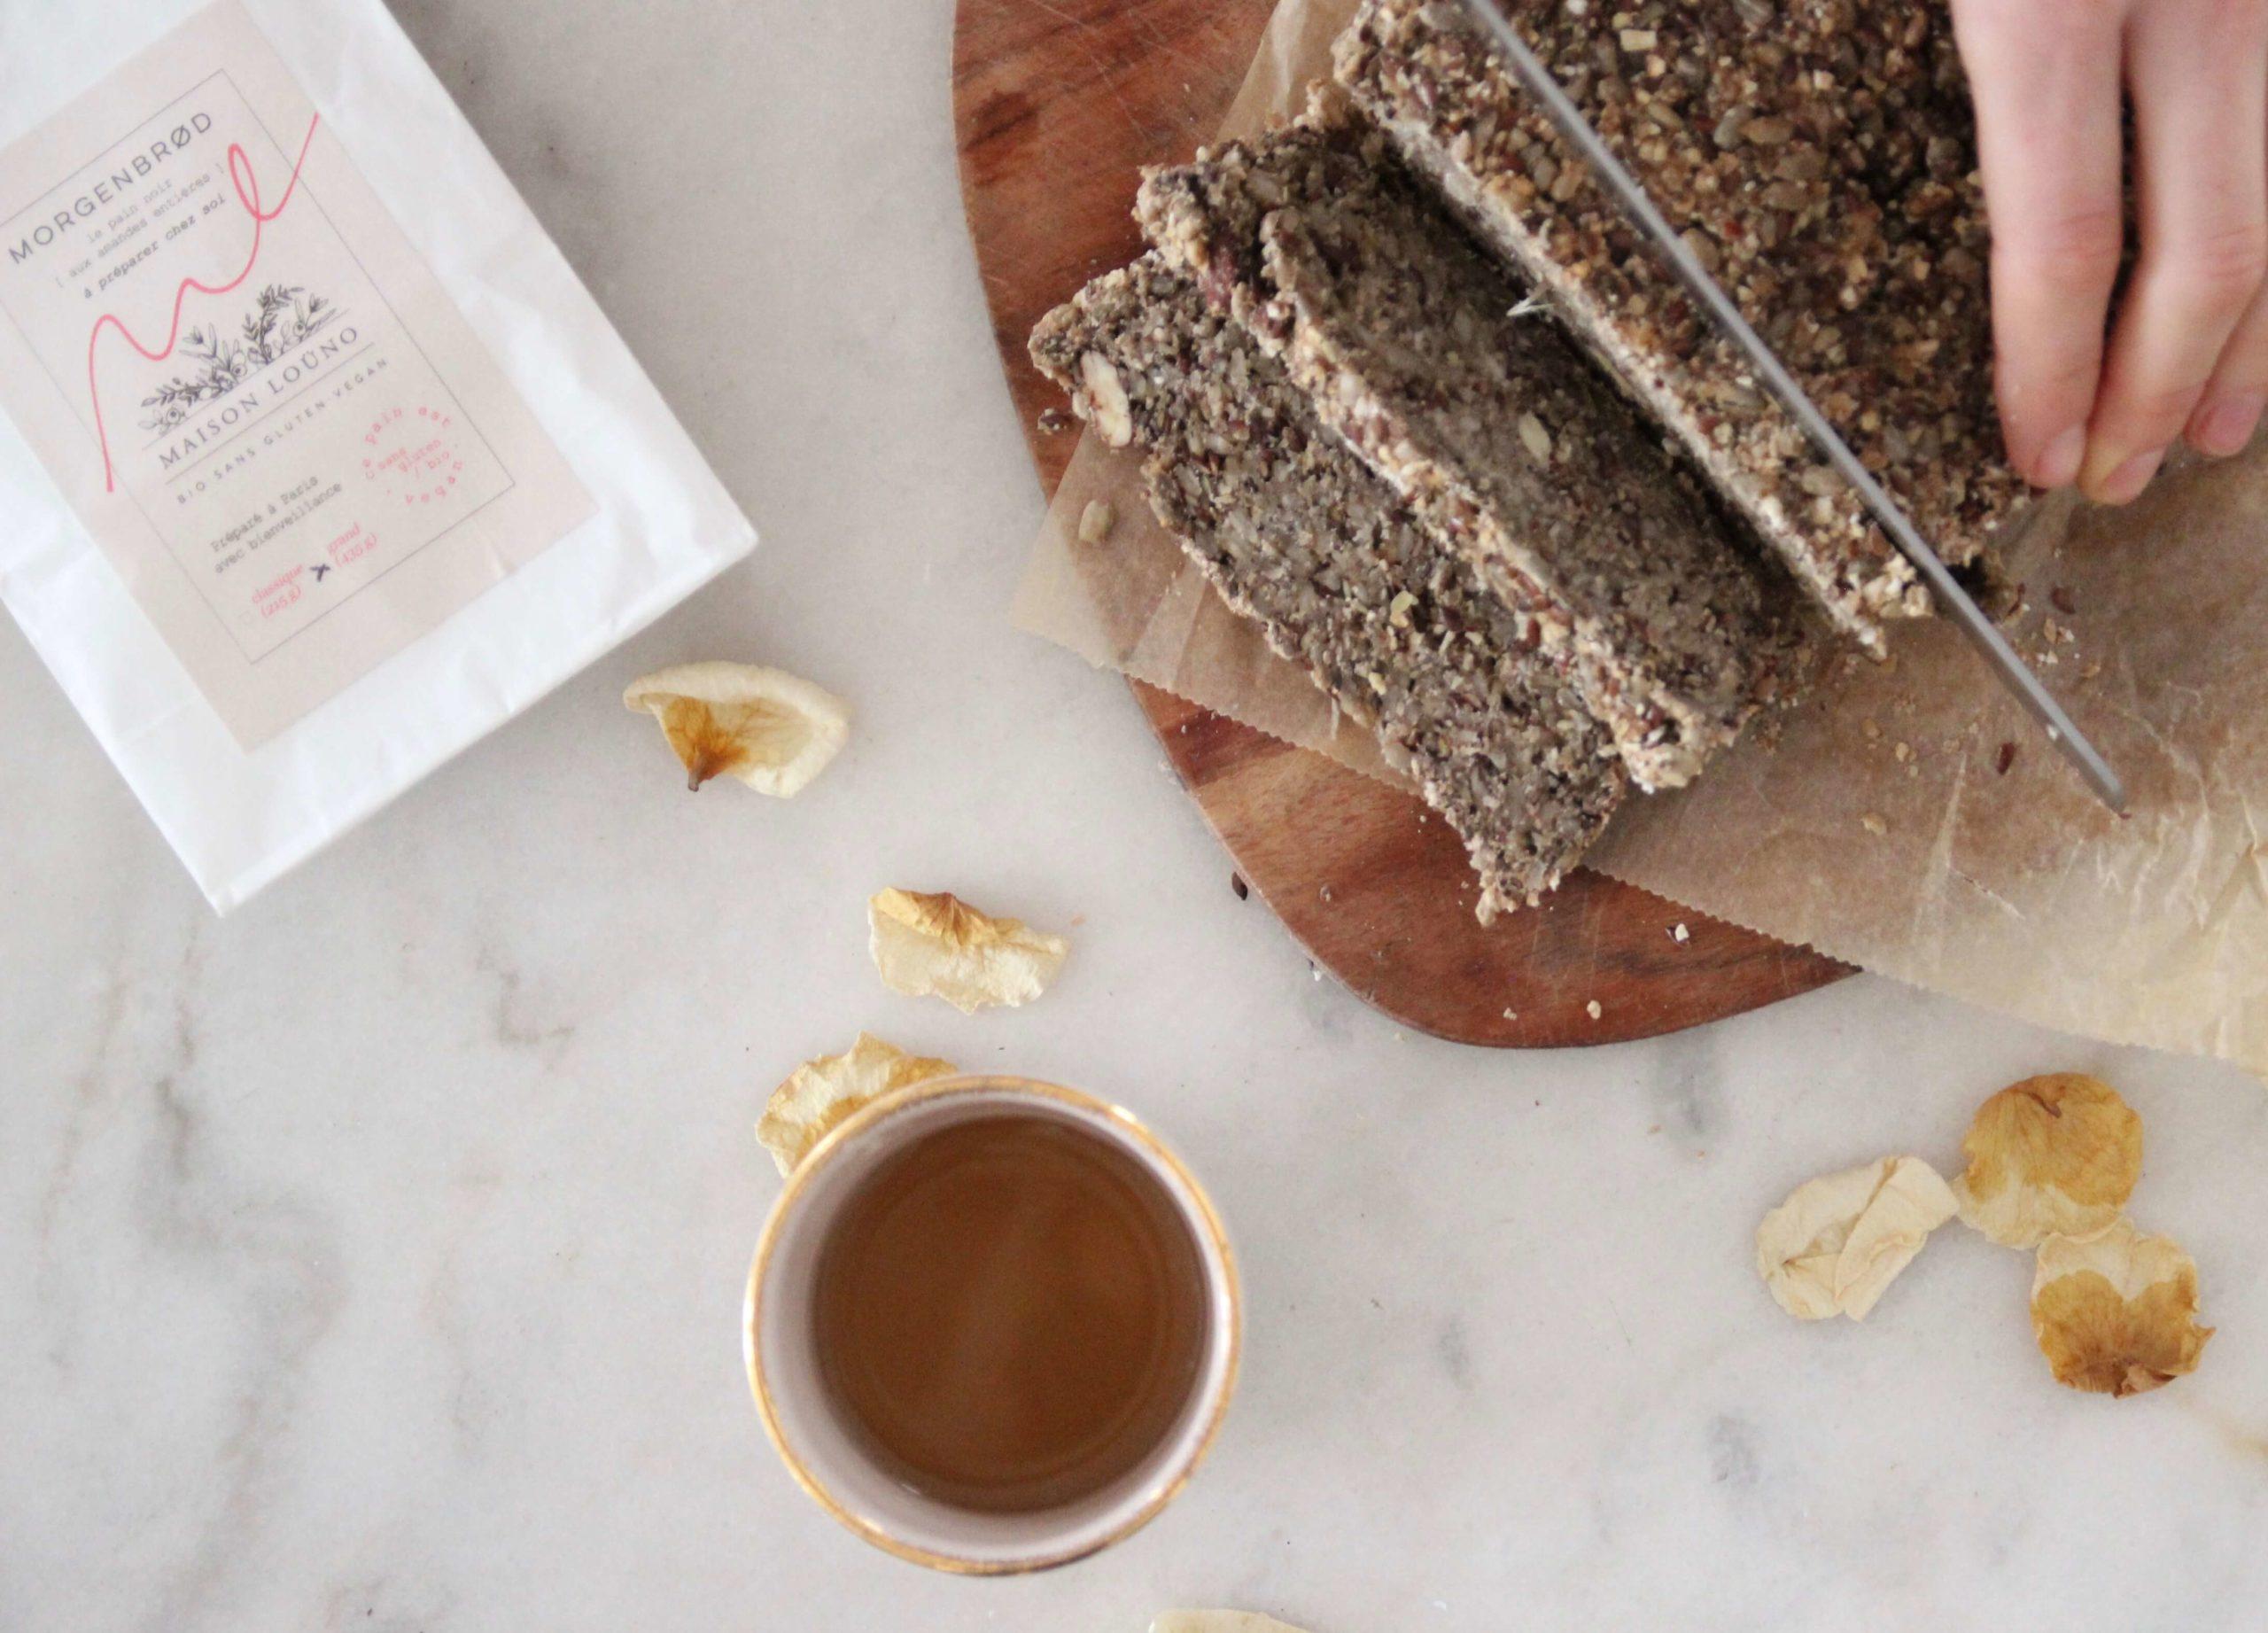 Bien manger sans gluten - Claire Andreewitch